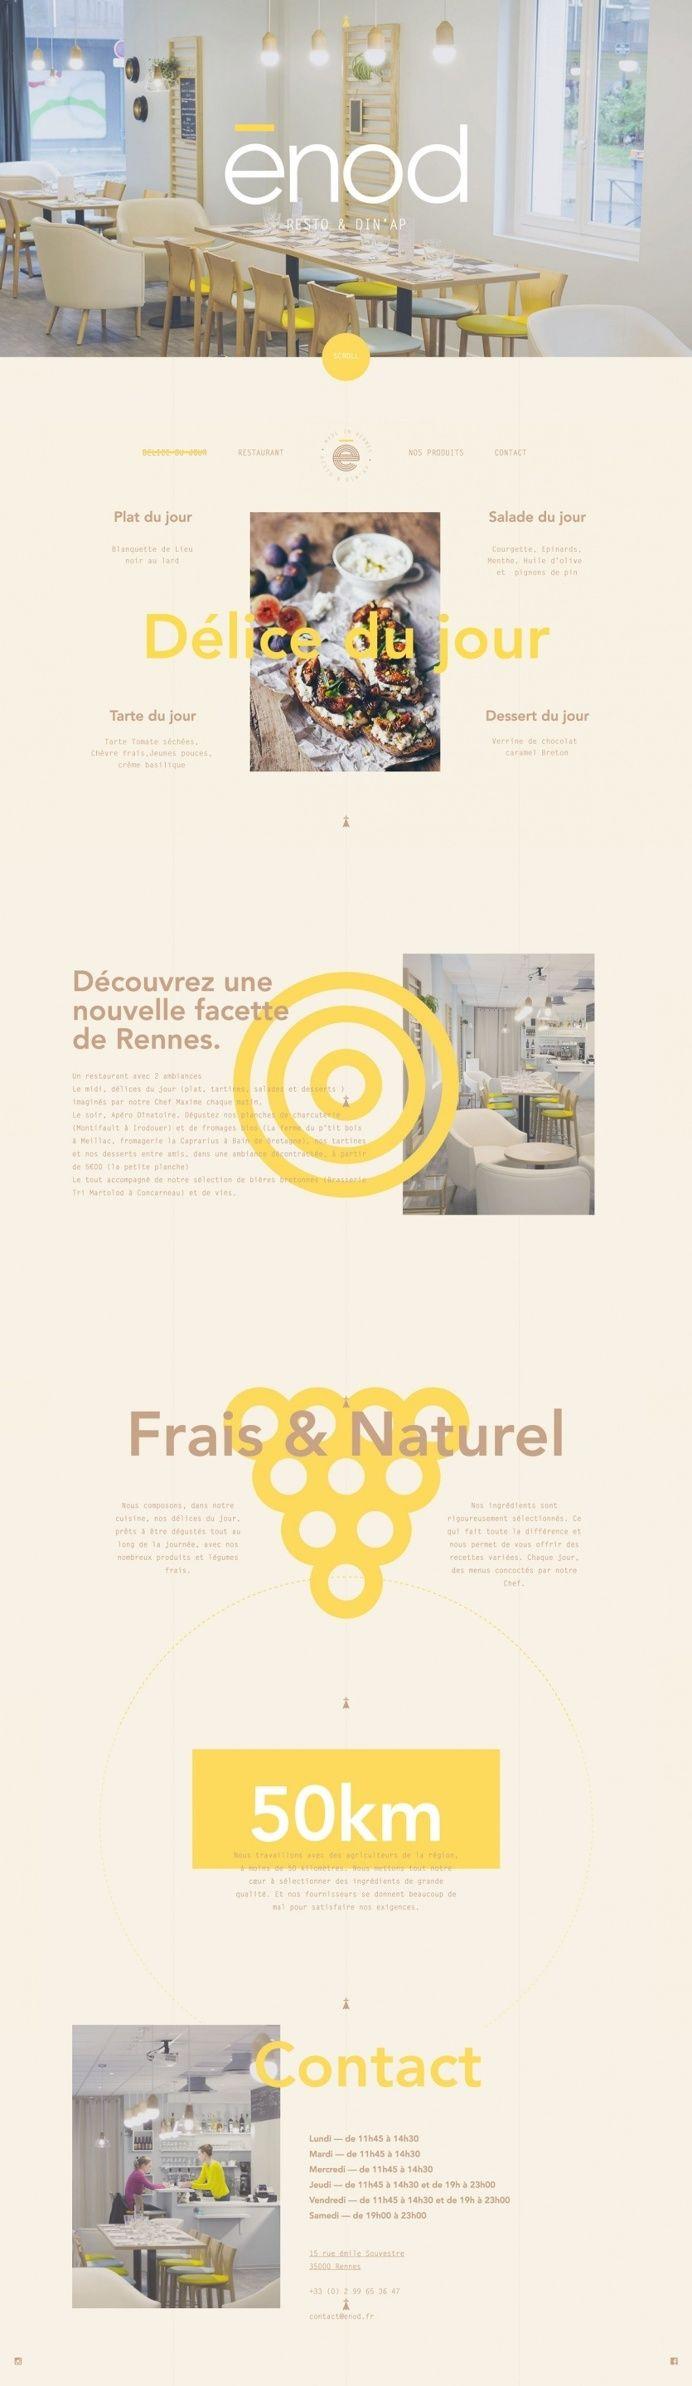 enod restaurant france paris webdesign beautiful branding best inspiration mindsparkle mag designblog award beauty beautiful new modern yell